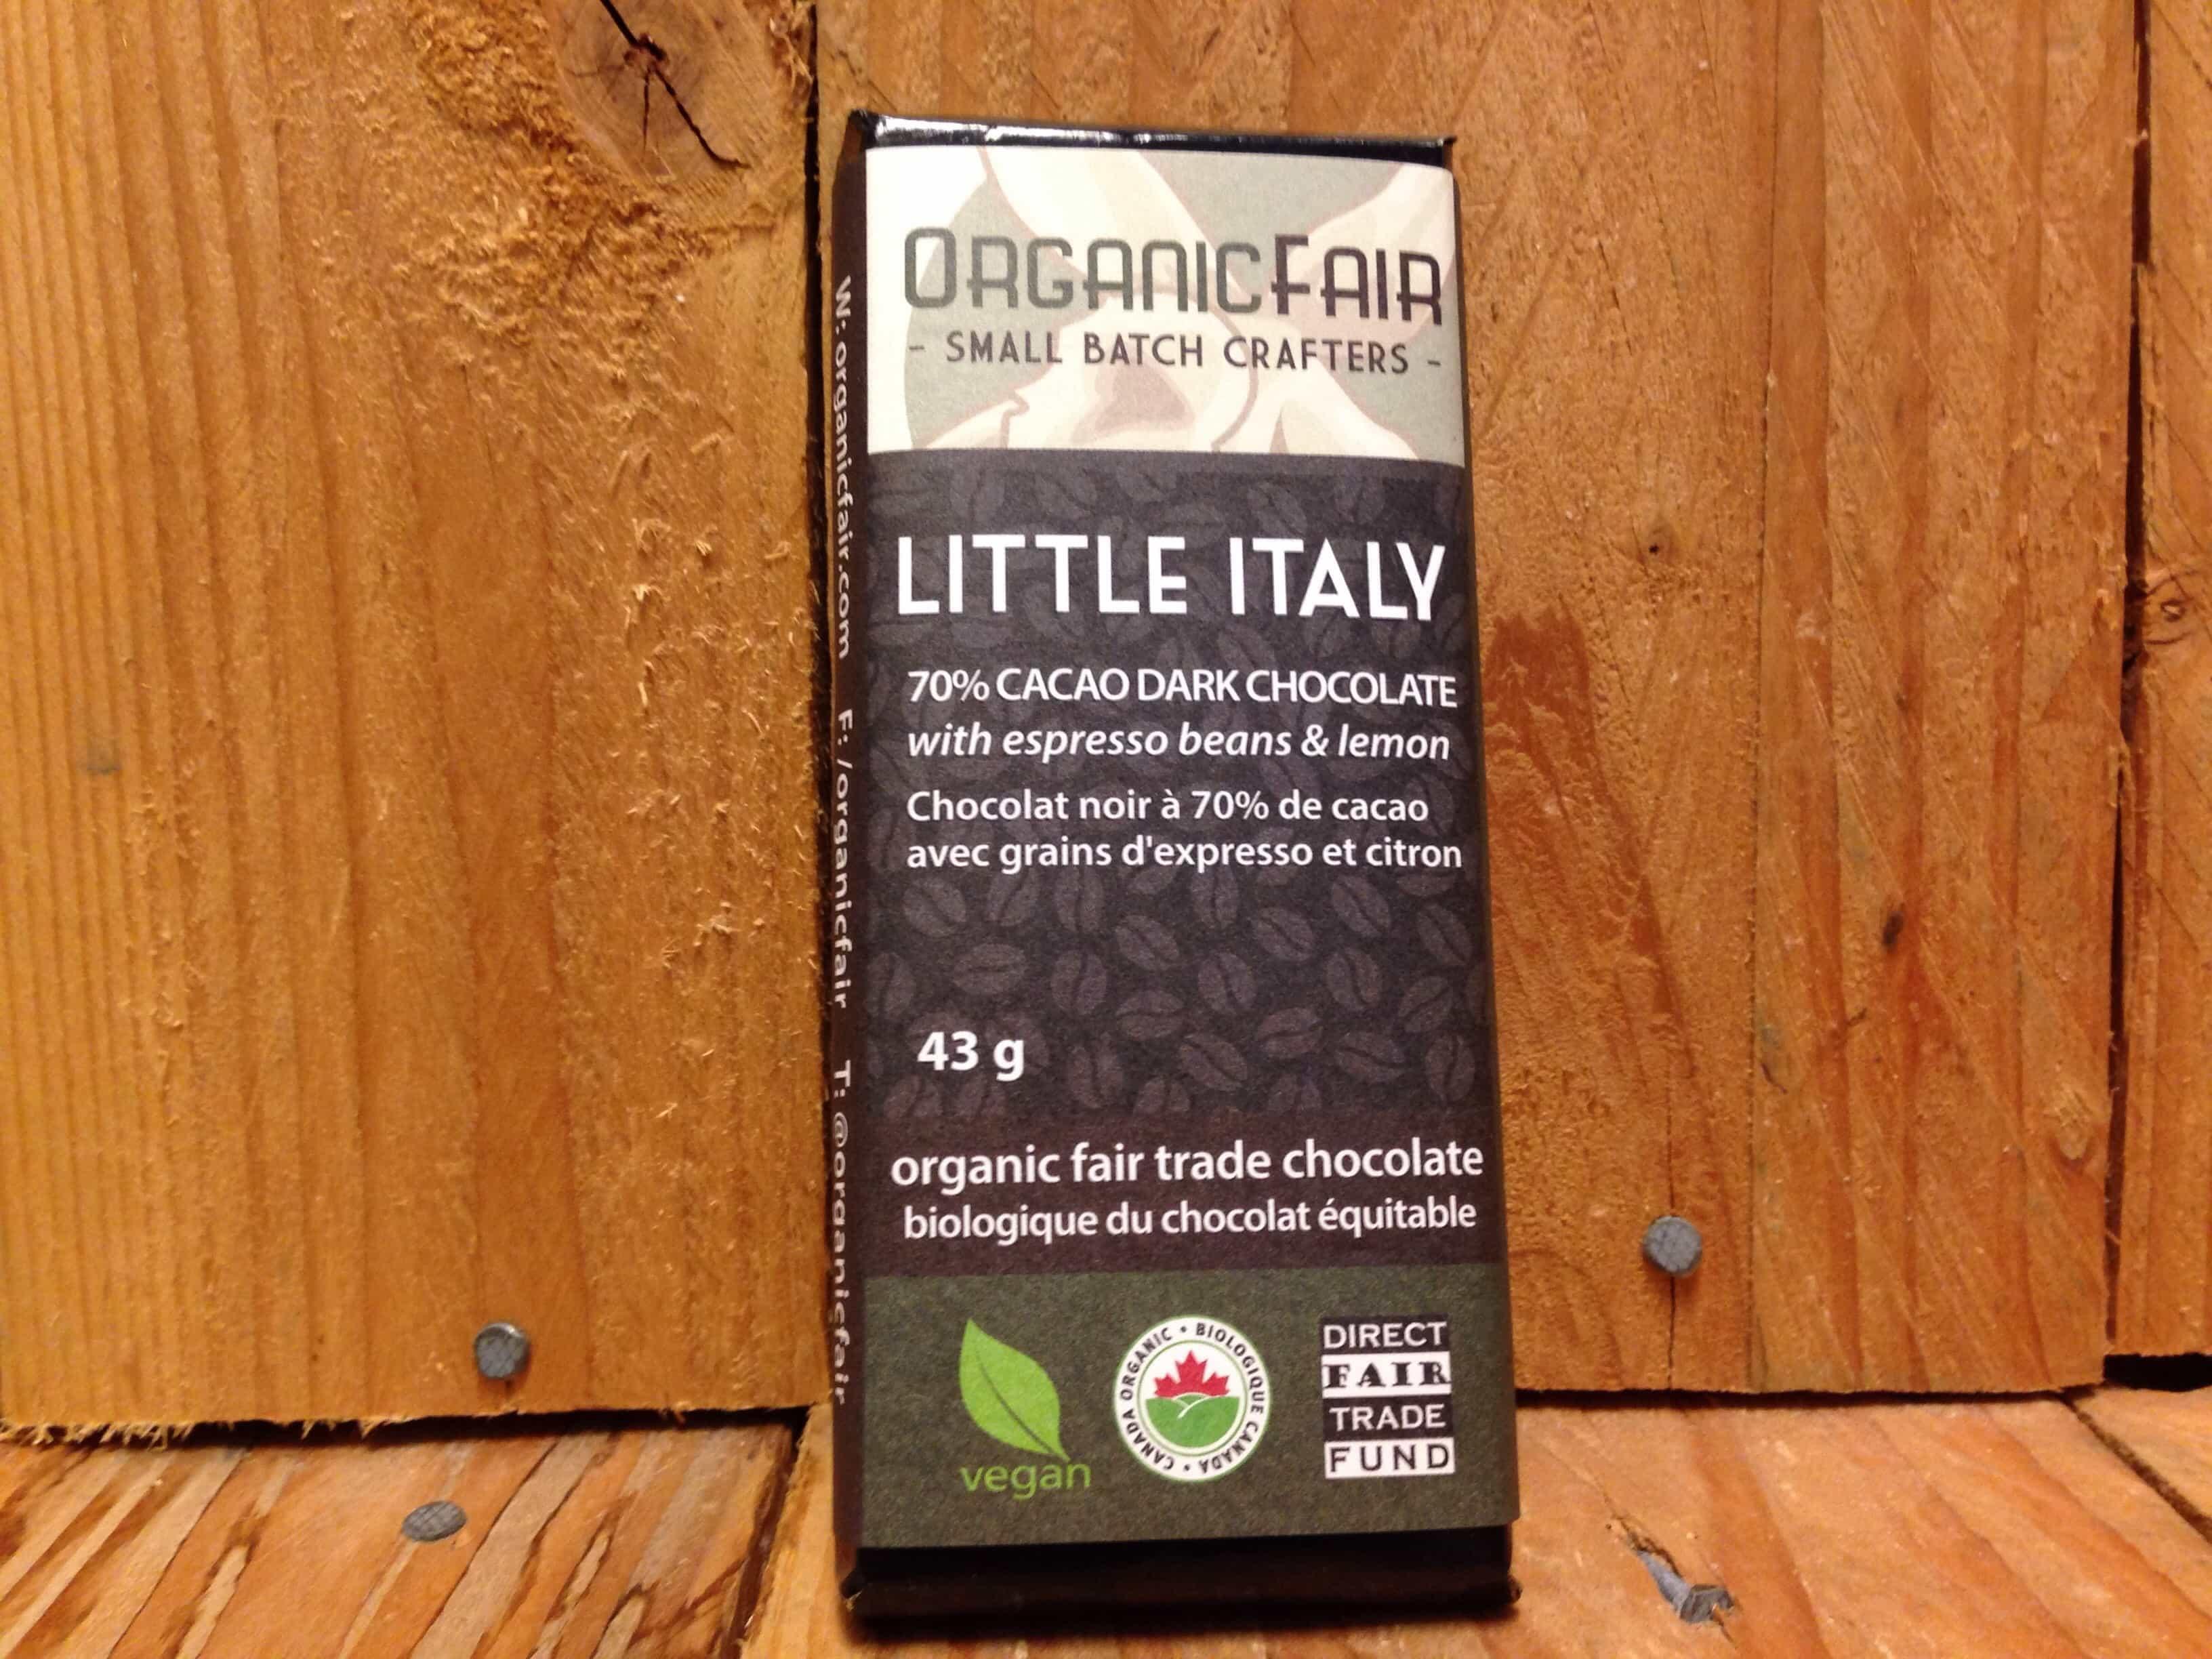 Organic Fair – Chocolate – Little Italy (43g)